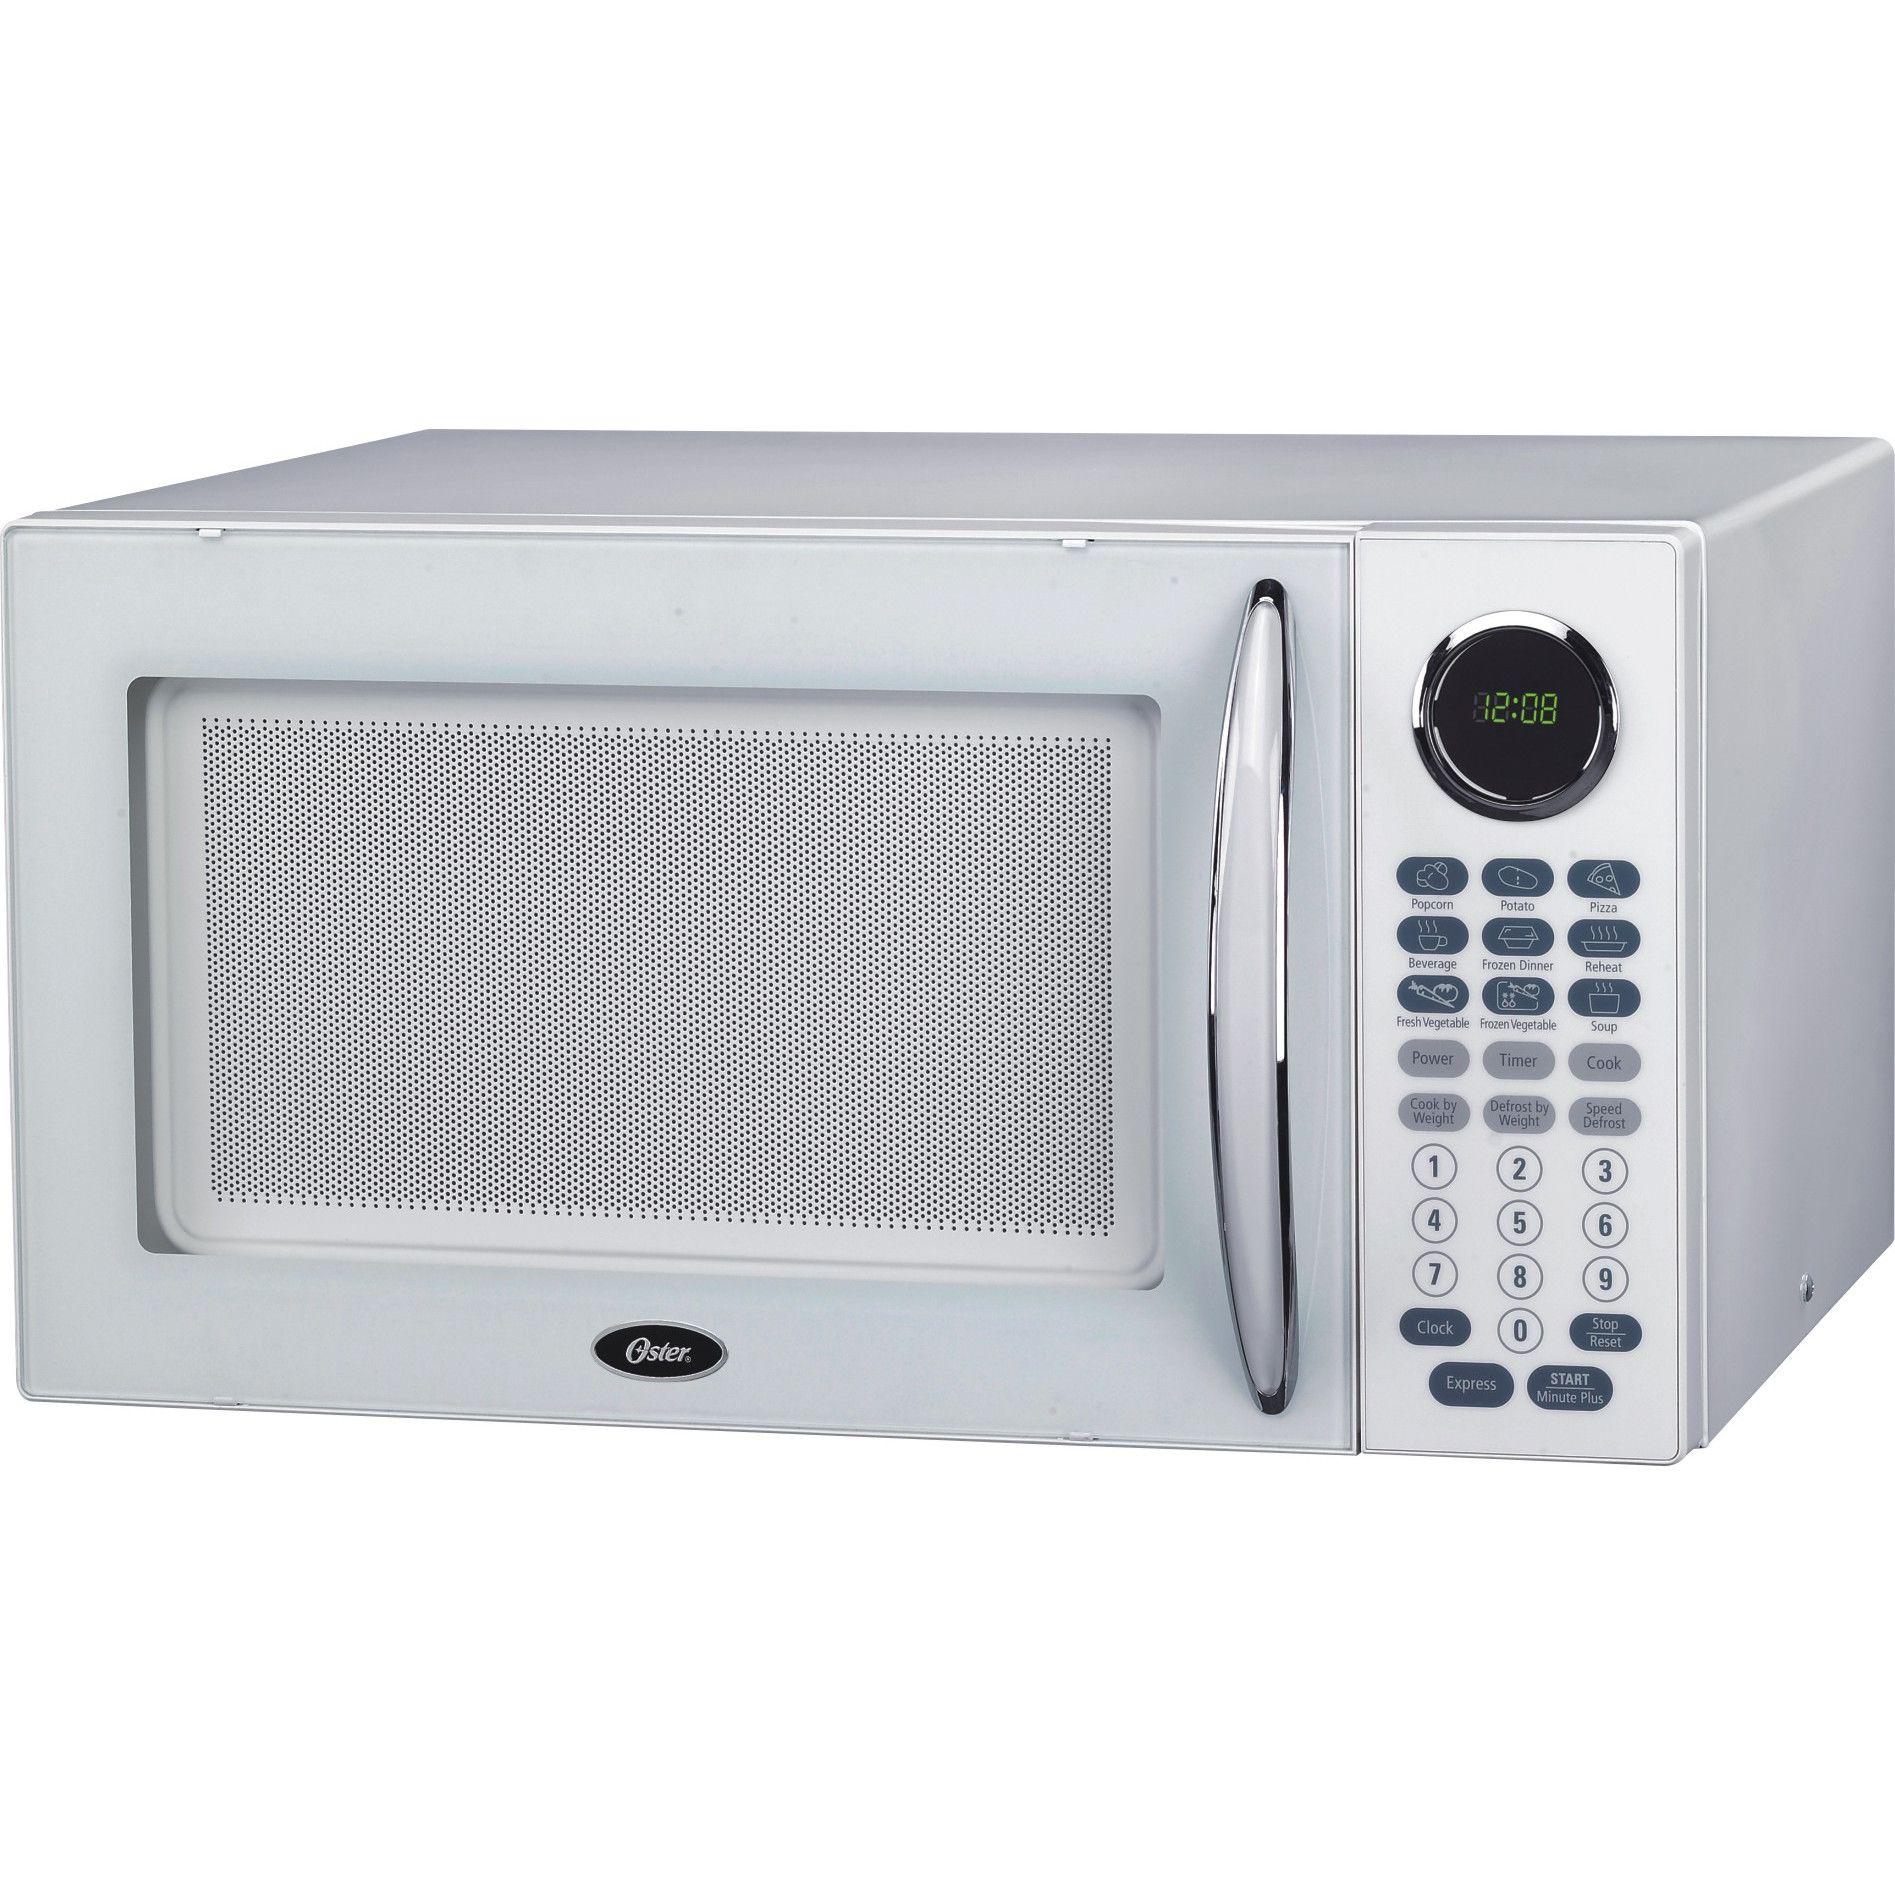 Oster 1 1 Cu Ft 1000w Countertop Microwave Digital Microwave